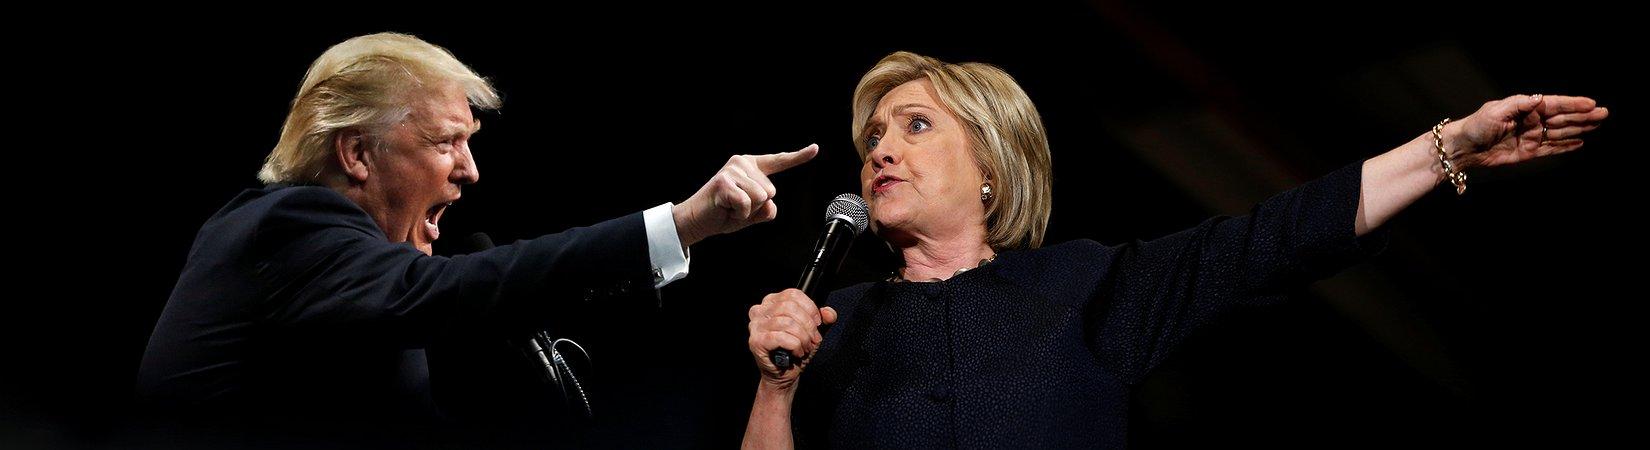 Trump gegen Clinton